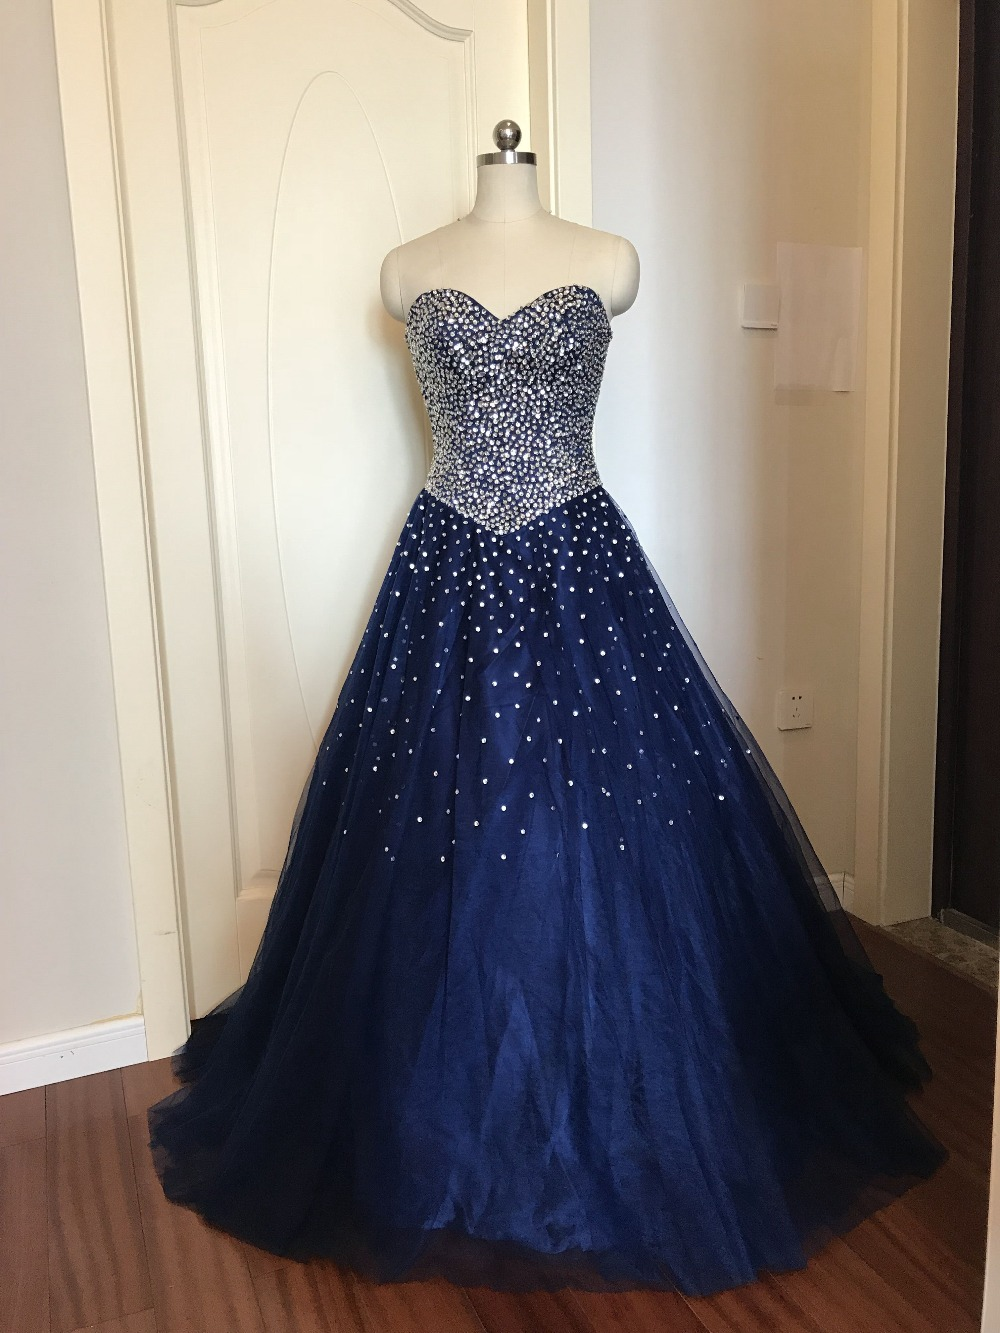 Bleu marine Quinceanera robes Stock robe de bal perlée chérie Abiti Da Quinceanera Vestido Debutante 15 Anos livraison gratuite - 6